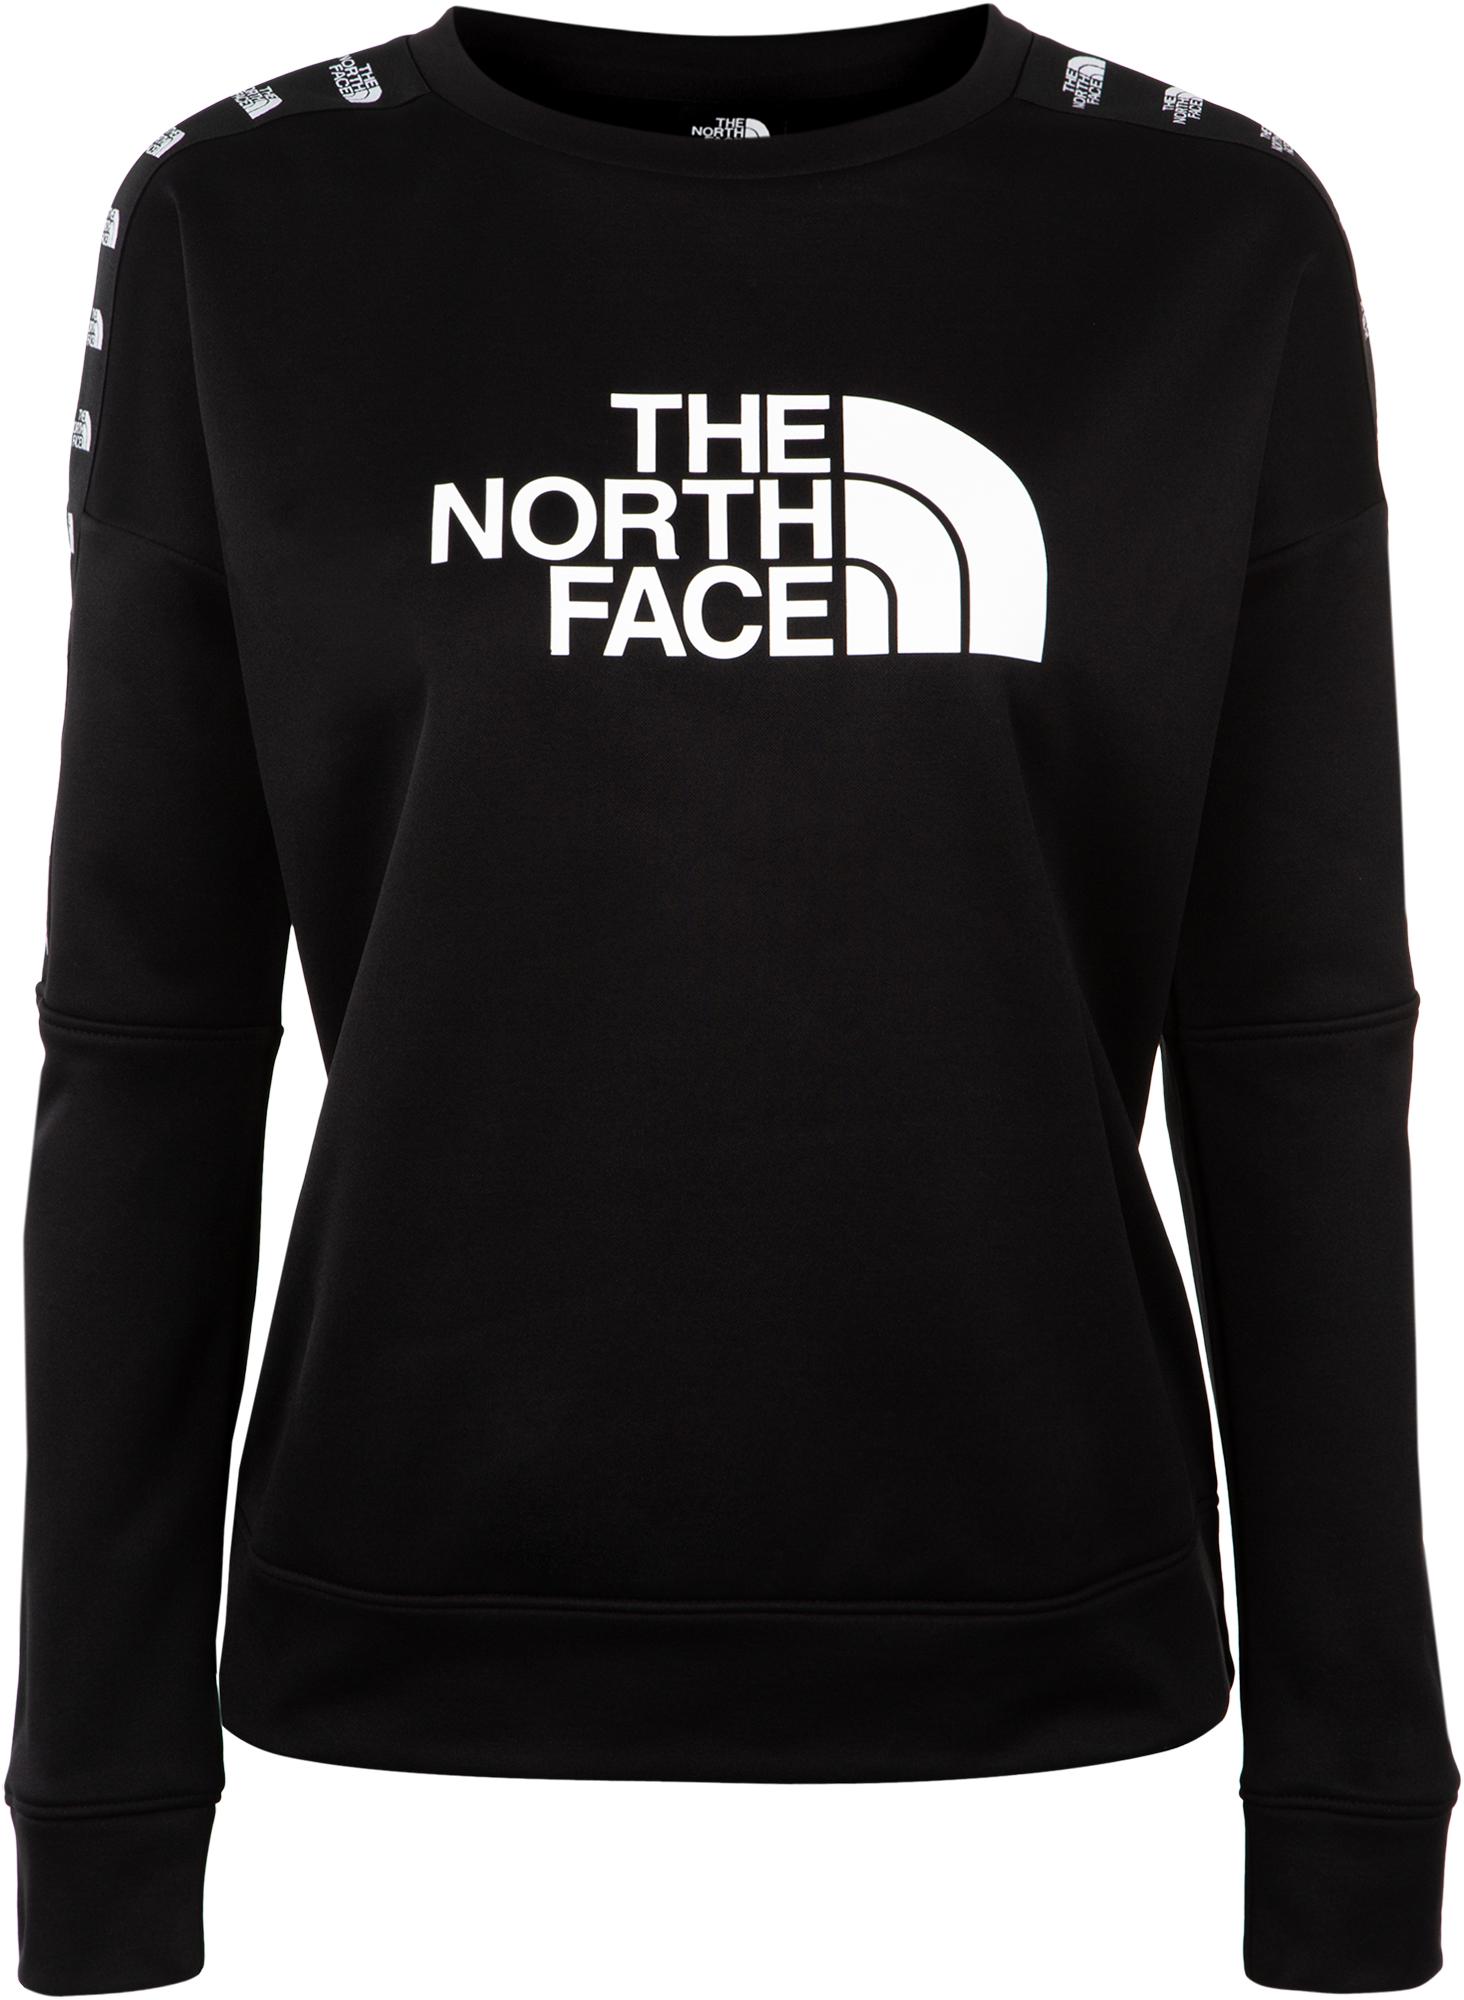 The North Face Свитшот женский TNL Crew, размер 48